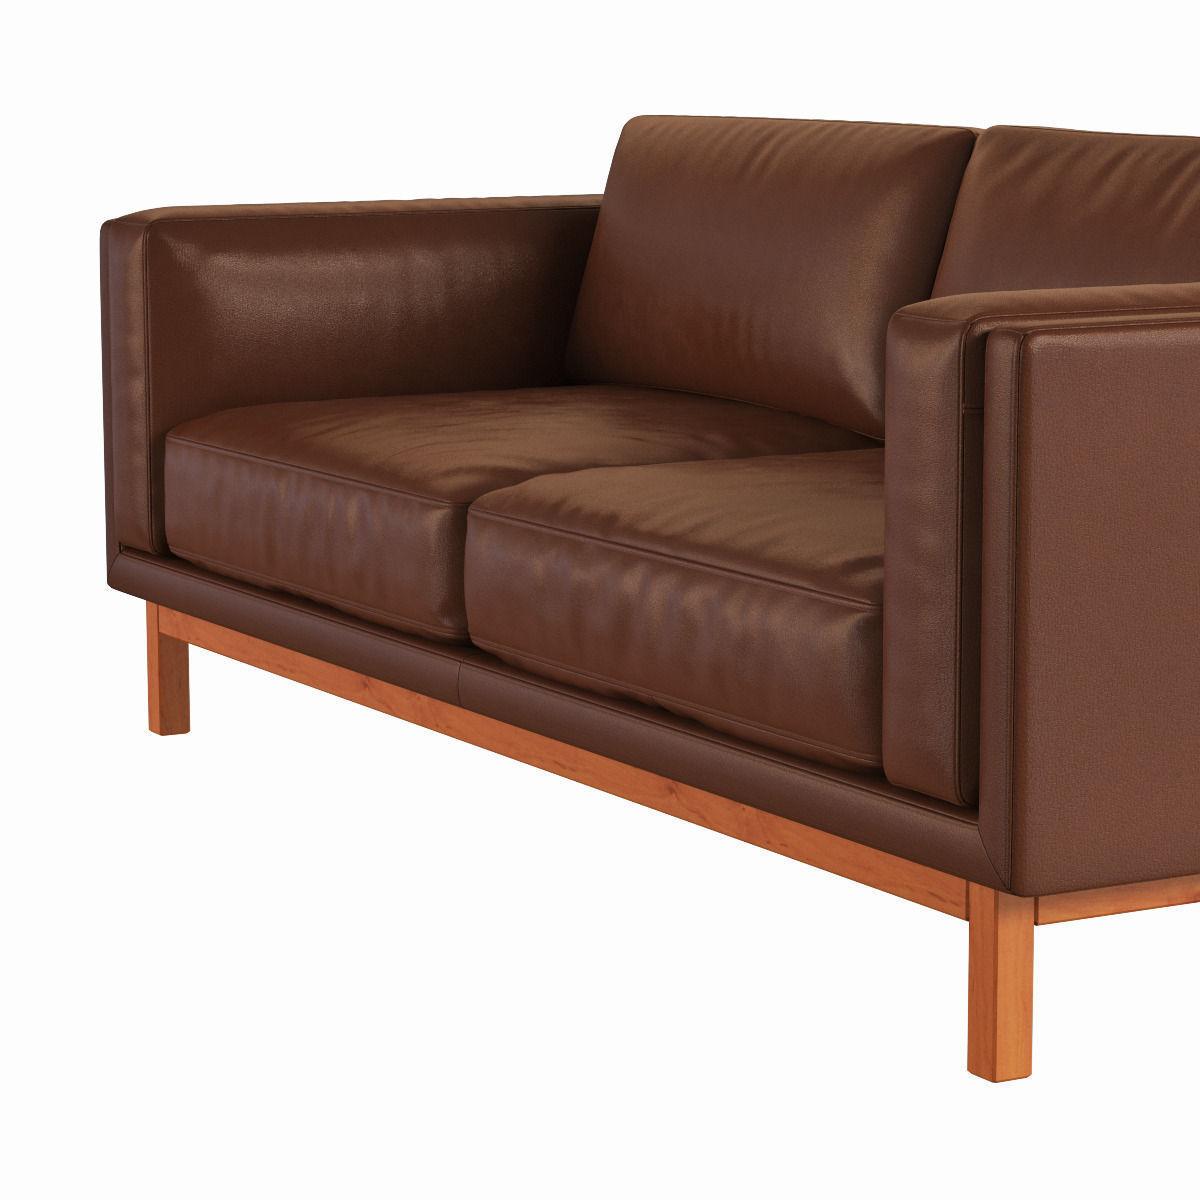 West elm dekalb leather sofa 3d model max obj fbx mtl for Elm furniture